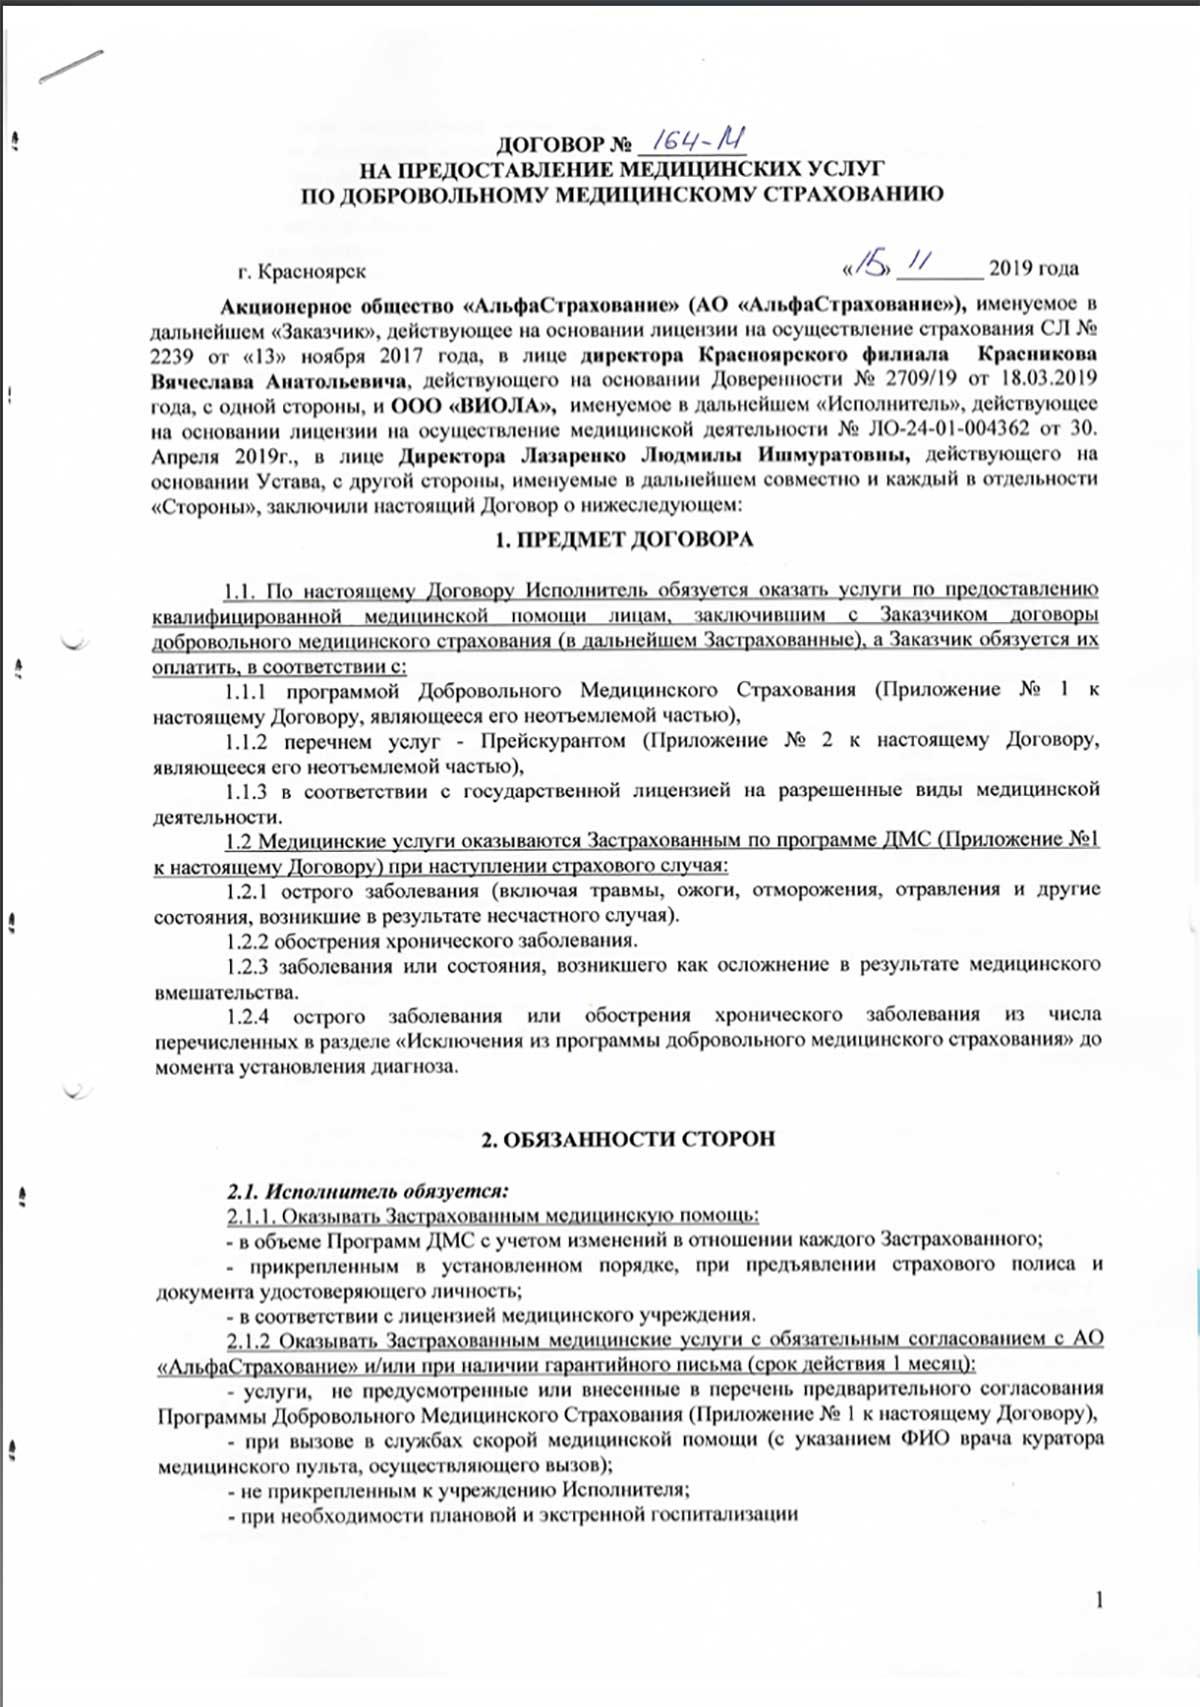 Договор ДМС